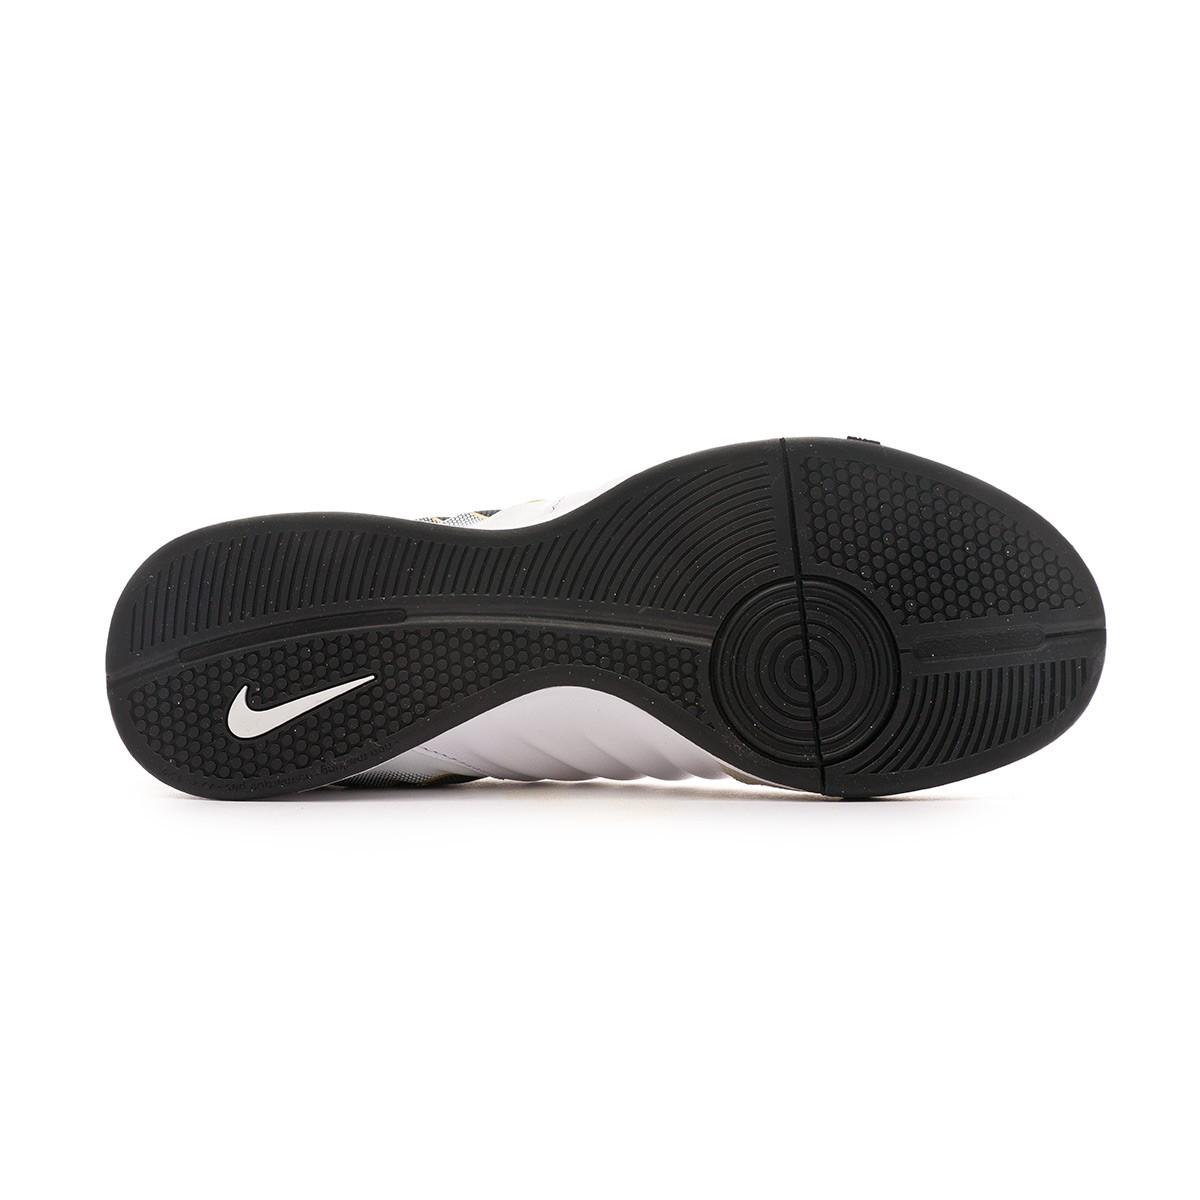 b7cd8a418b Zapatilla Tiempo LegendX VII Academy IC White-Black. CATEGORY. Futsal   Discount Nike ...